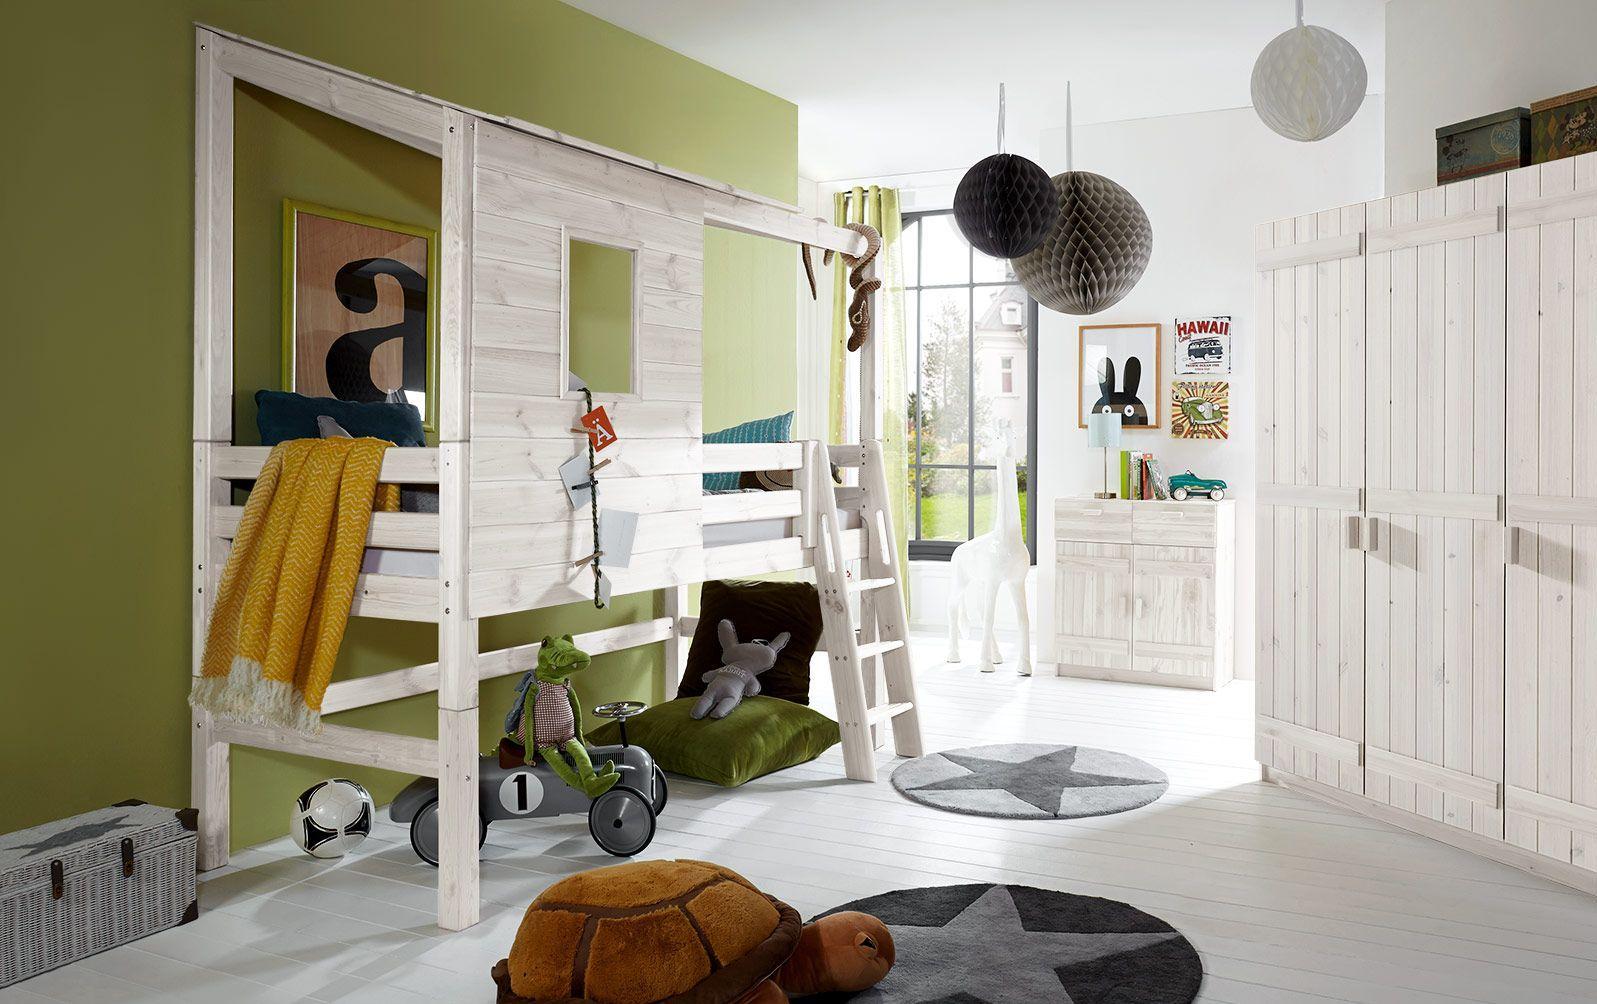 Abenteuer-Hochbett Kids Paradise aus lasierter Kiefer in 117 cm Bettrahmenhöhe